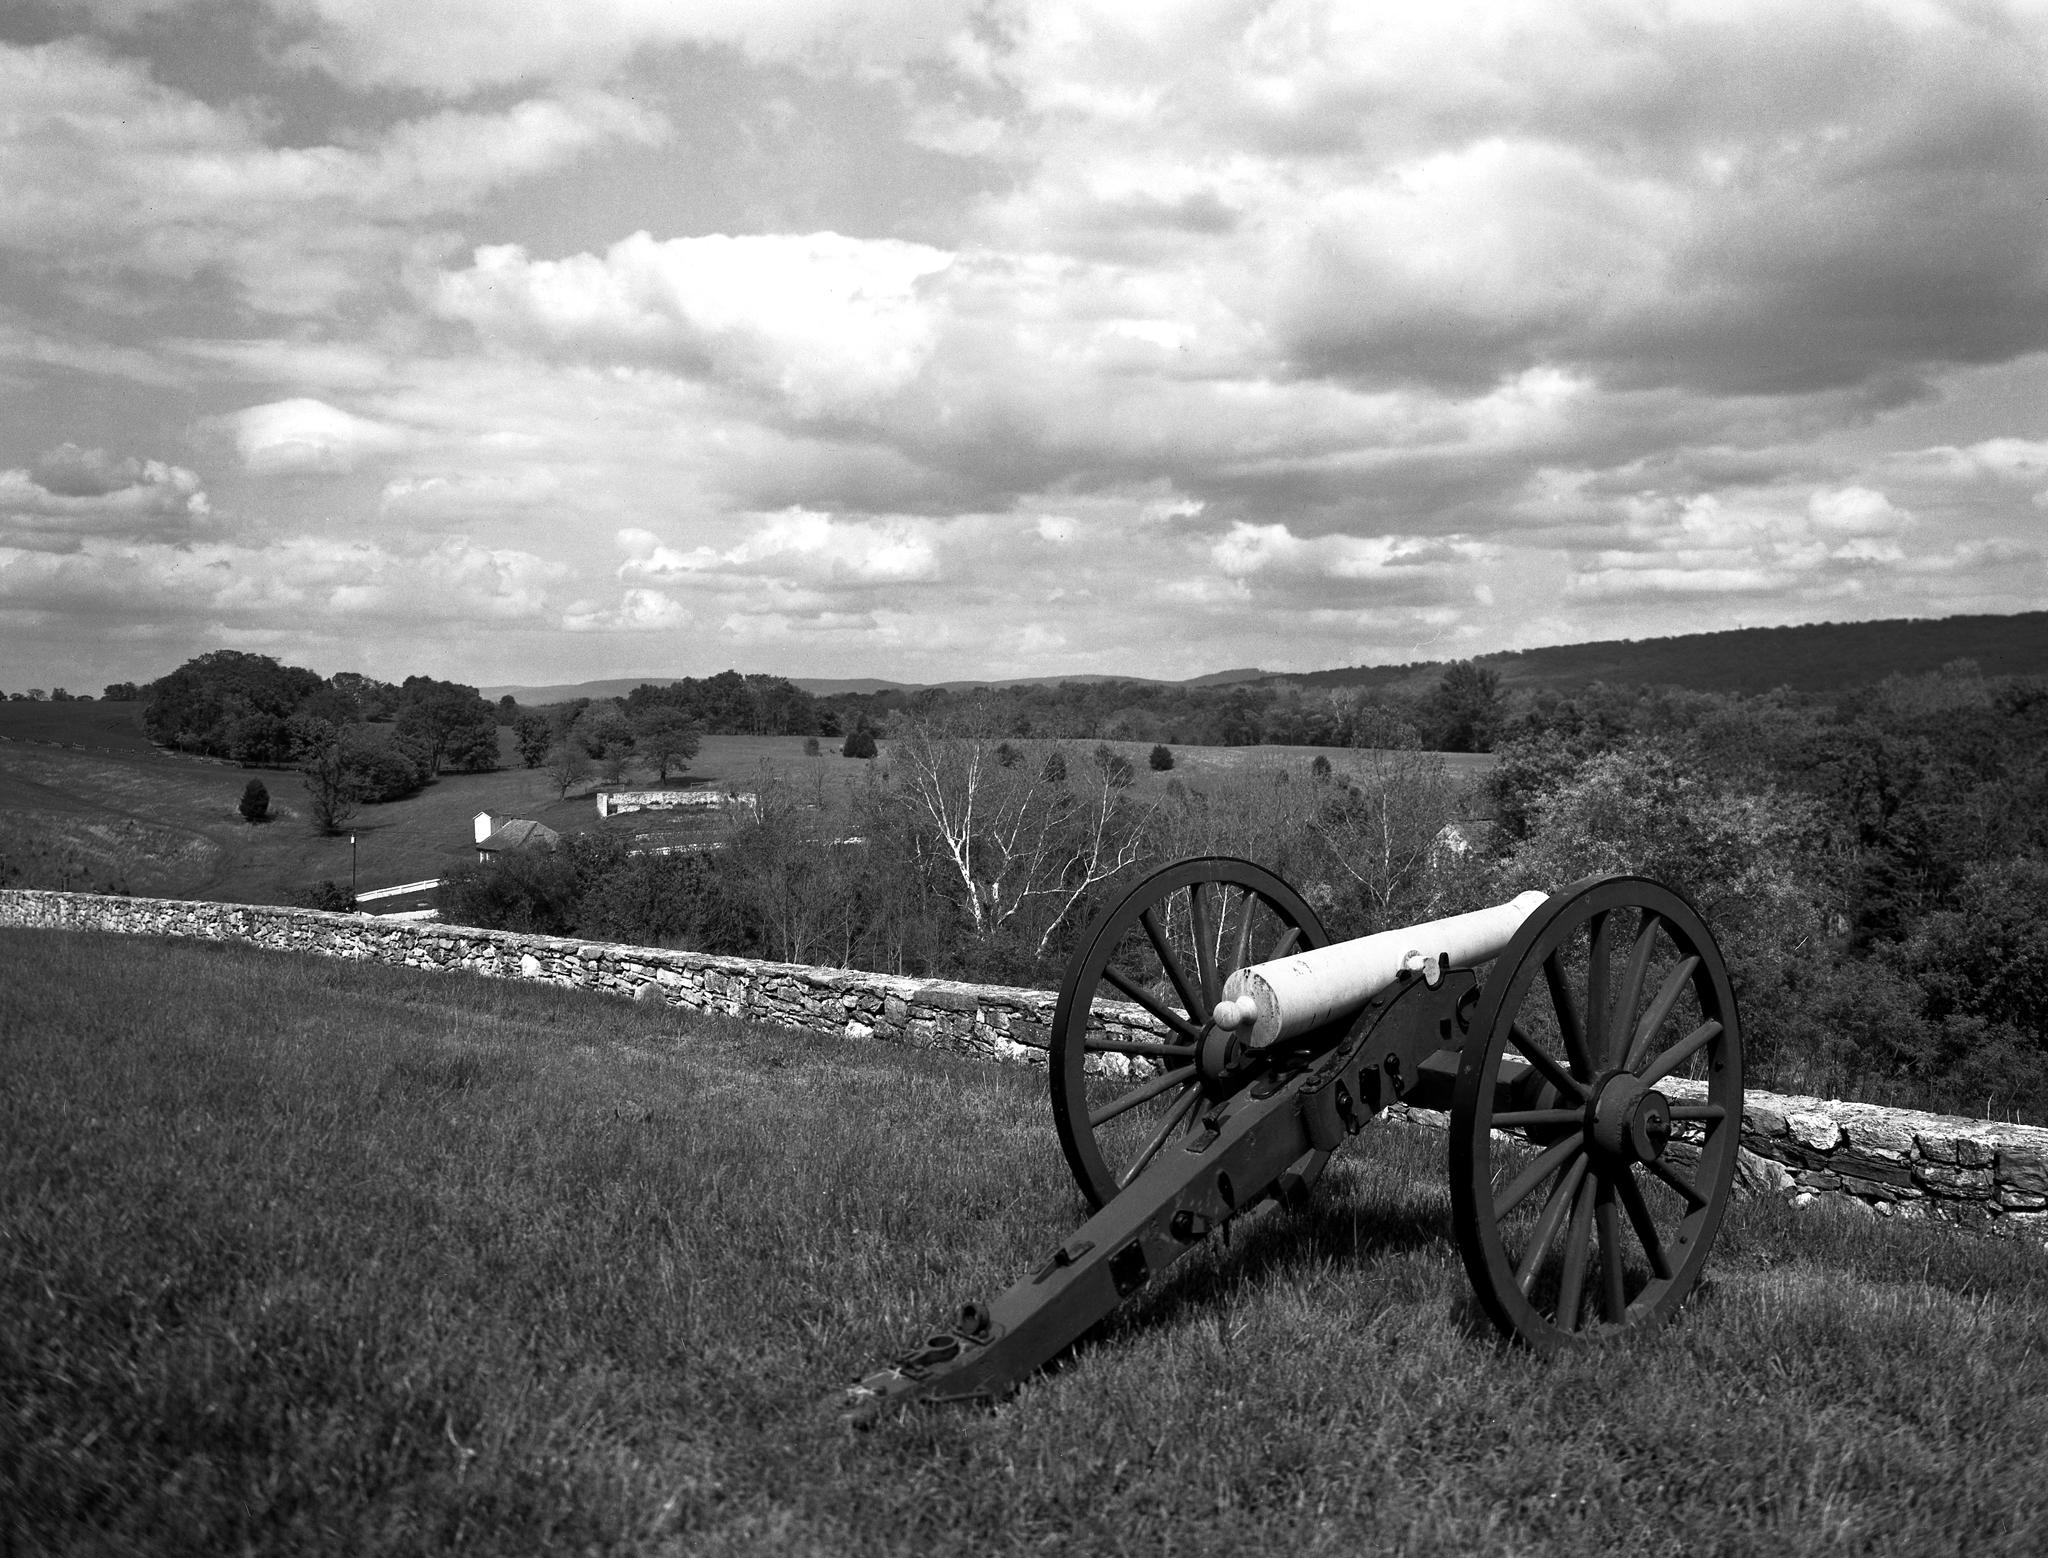 4x5_for_365_project_0138_Antietam_2014-05_17_bp_4x5_90mm_AristaEDU200_1200dpi_hilltop_canon.png